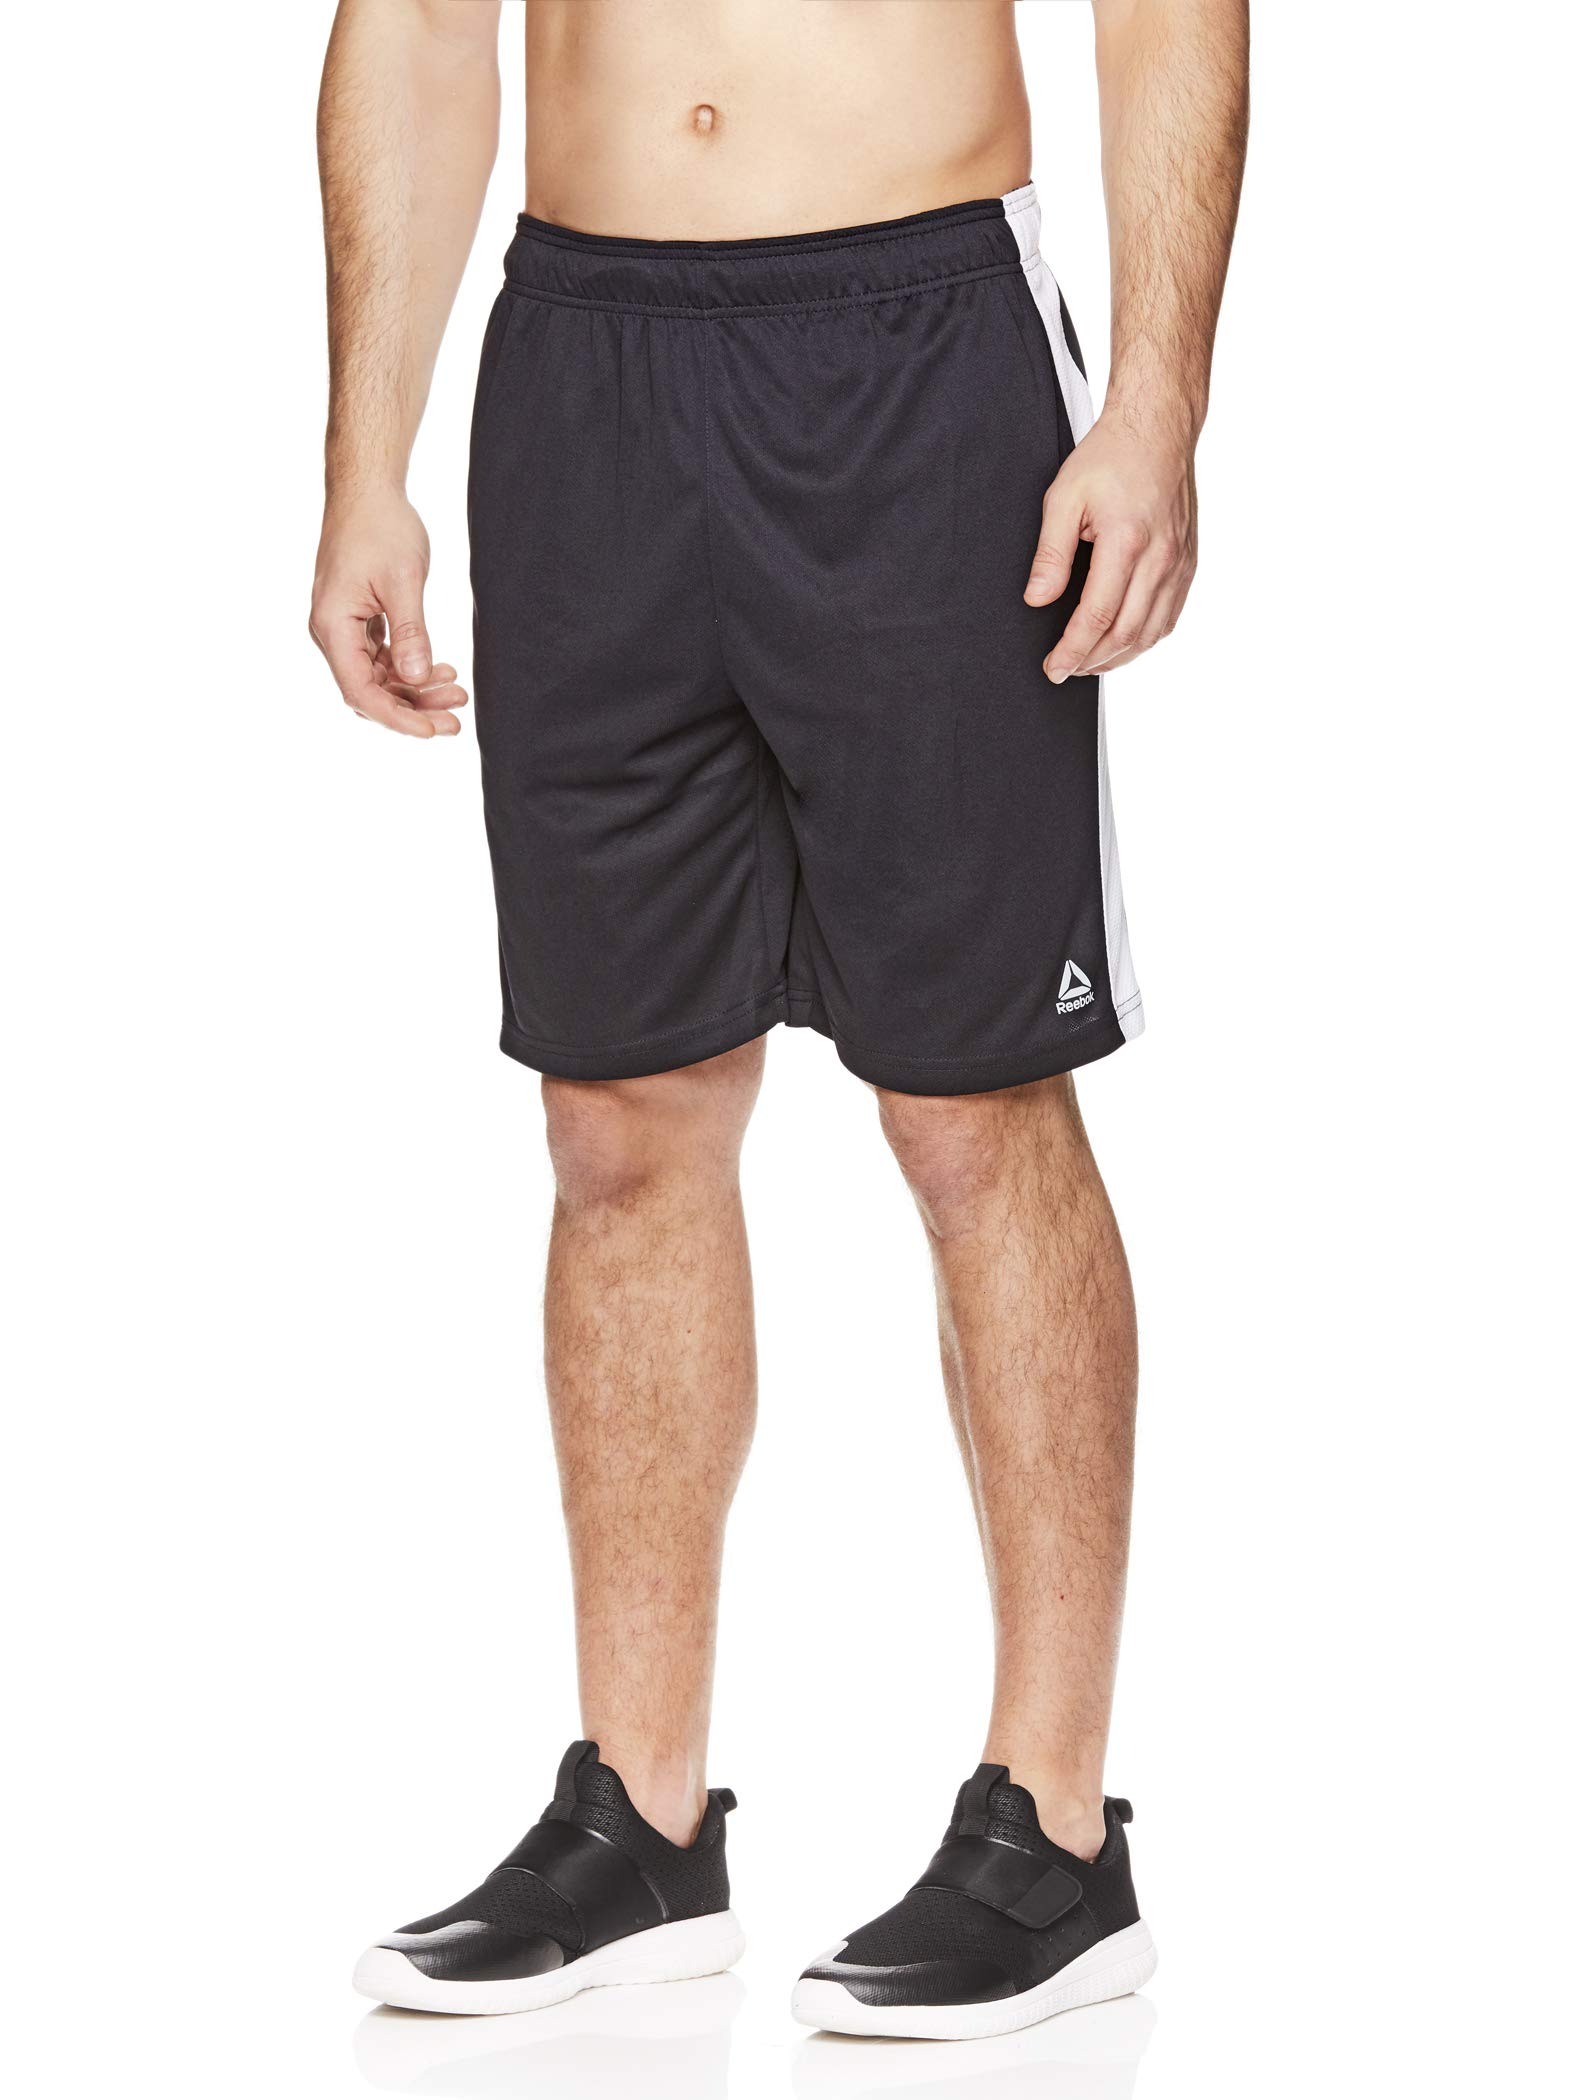 Reebok Men's Drawstring Shorts - Athletic Running & Workout Short w/Pockets - Dadson Black Heather/Stark White, Small